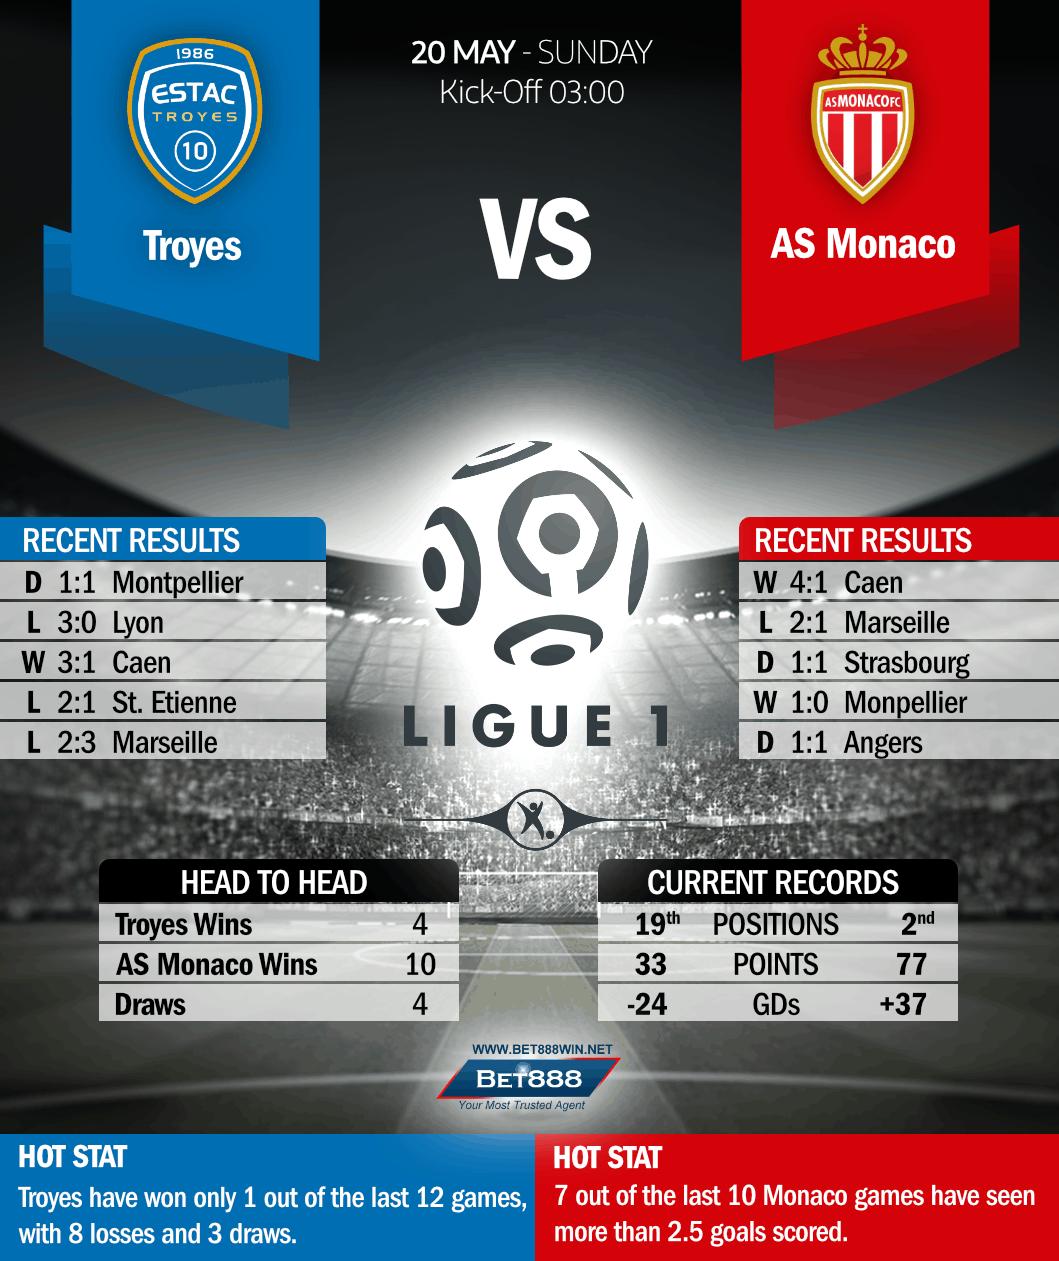 Troyes vs AS Monaco 20/05/18